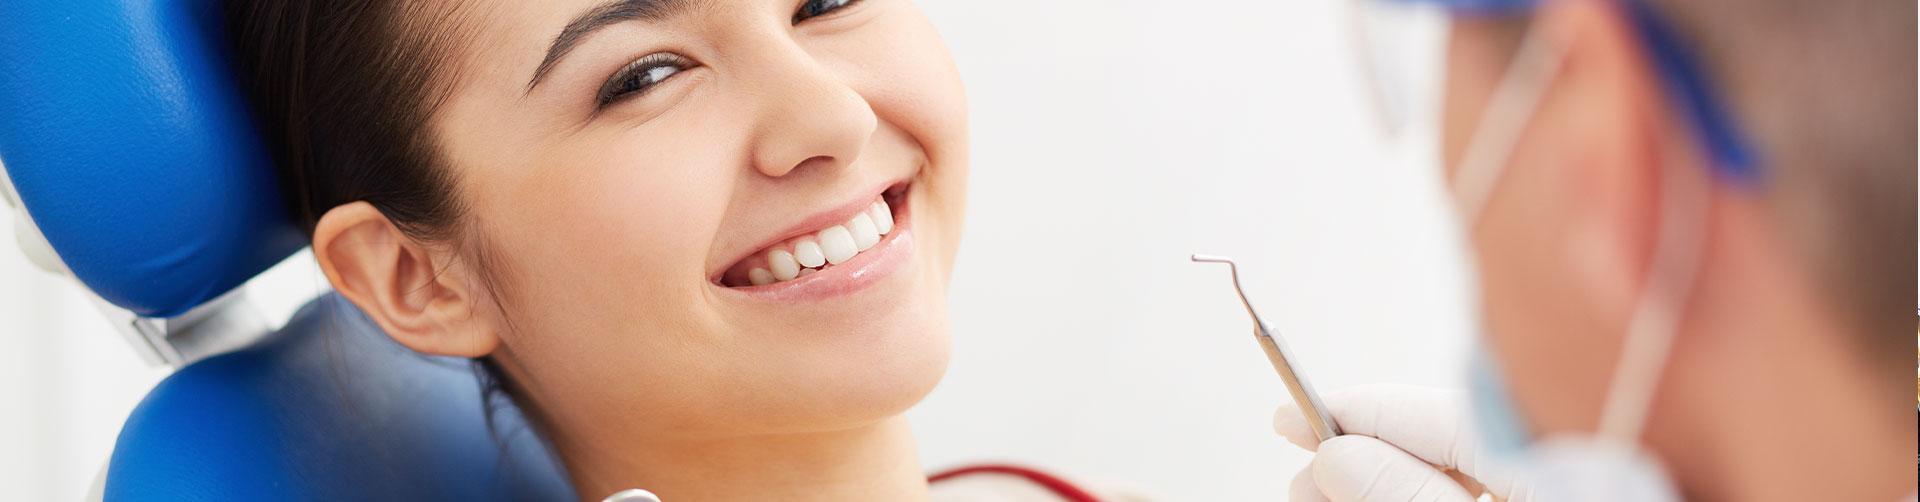 Girl smiling at dental